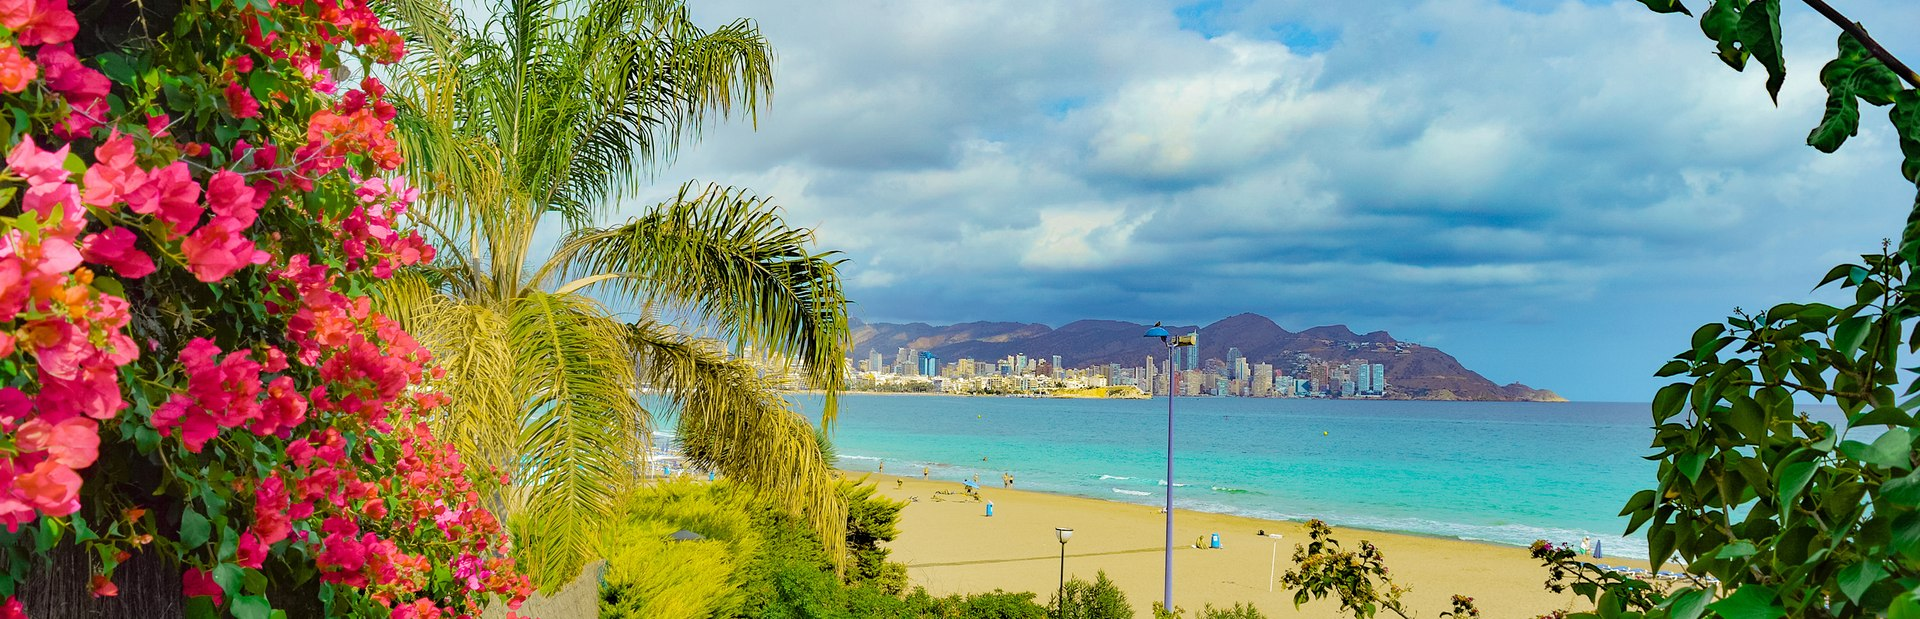 The Balearics climate photo